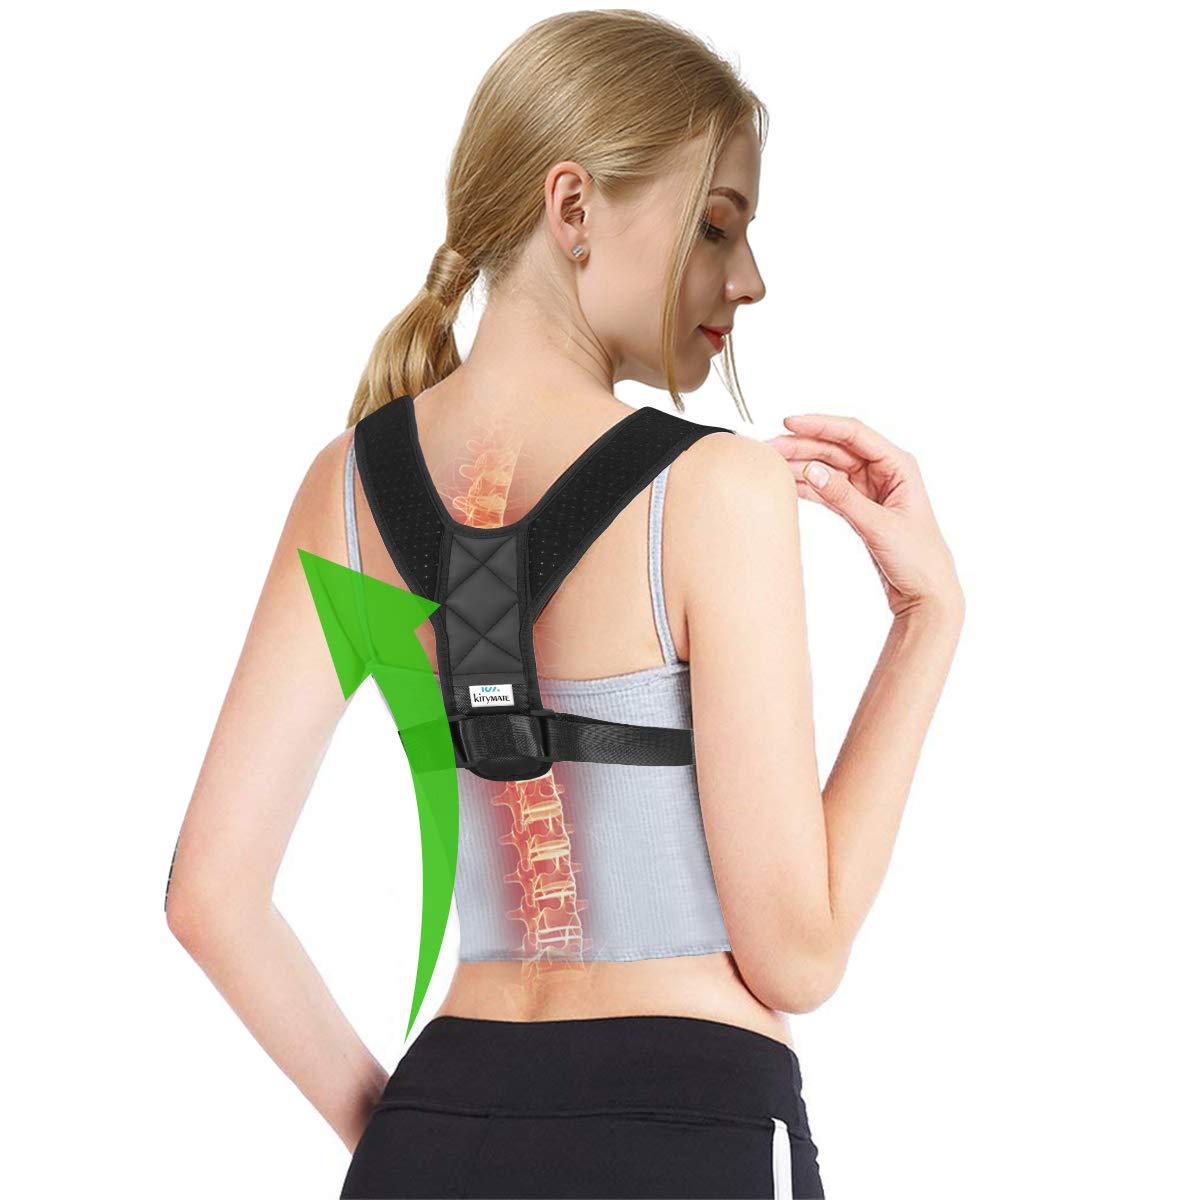 Kitymate Effective Posture Corrector & Back Support Brace for Women and Men, Adjustable Clavicle Brace,Improve Thoracic Kyphosis, Shoulder Support, Upper Back & Neck Pain Relief